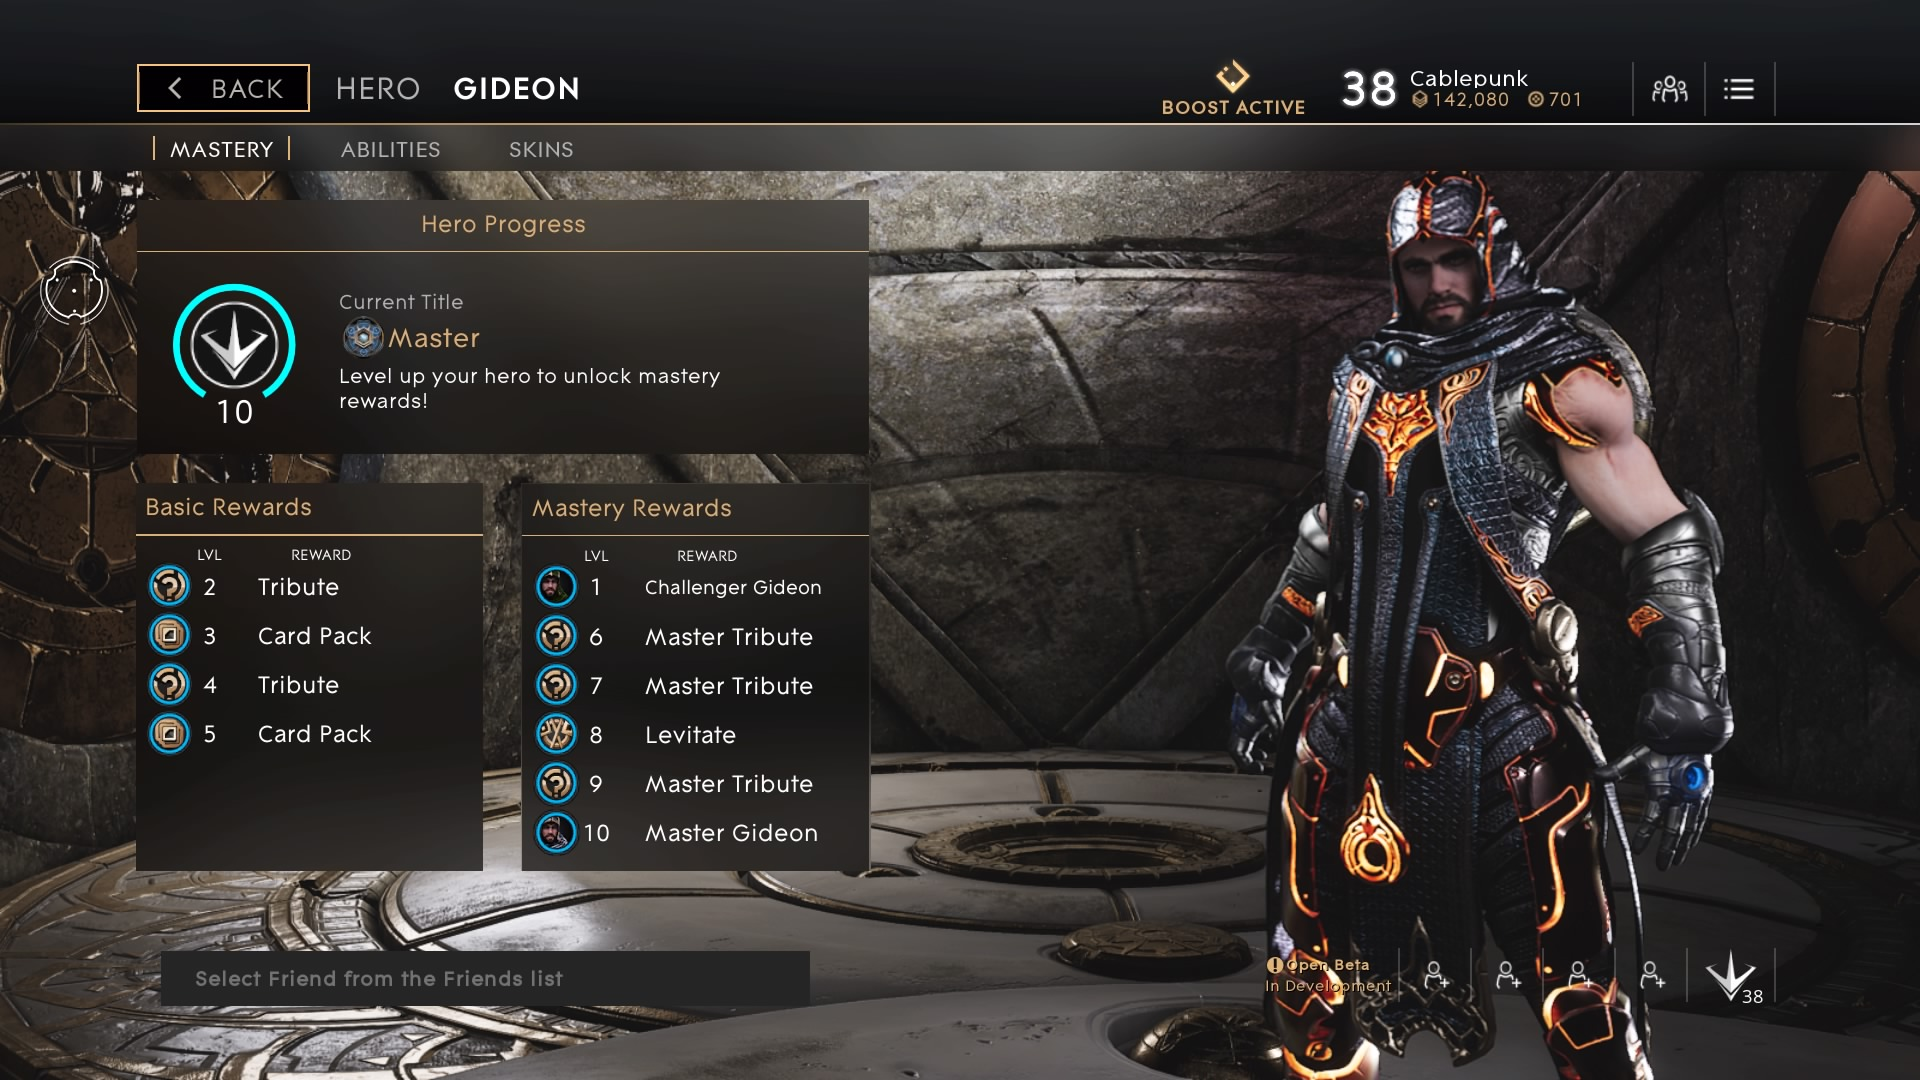 Master Gideon